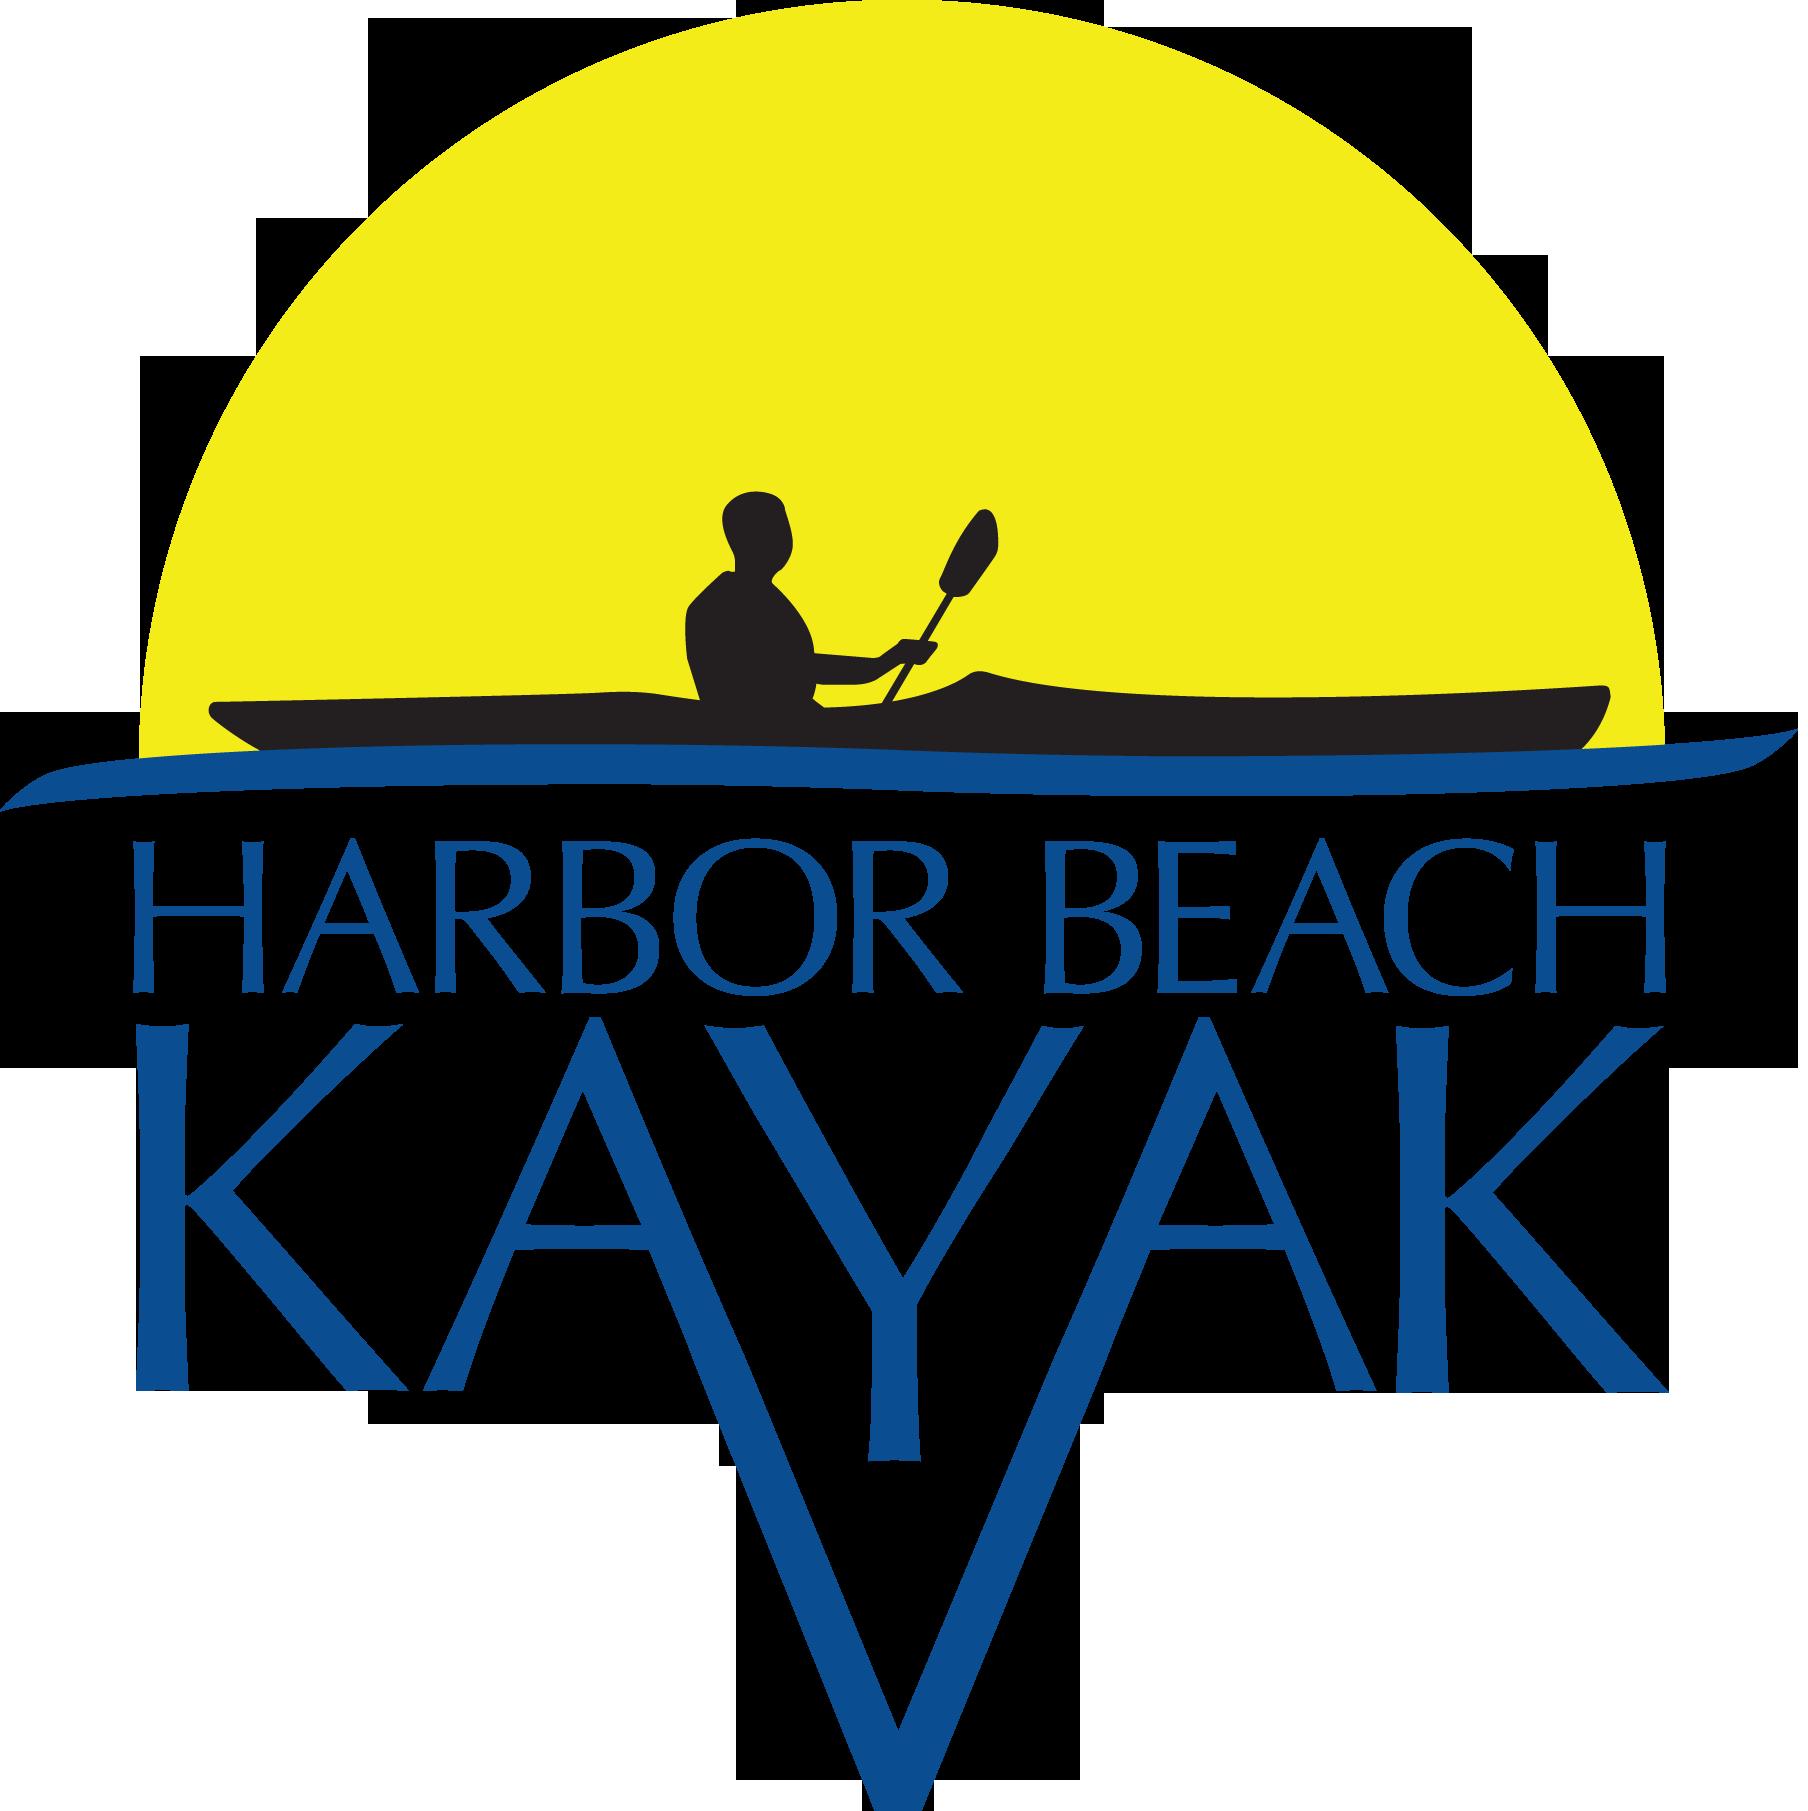 Harbor Beach Kayak Logo